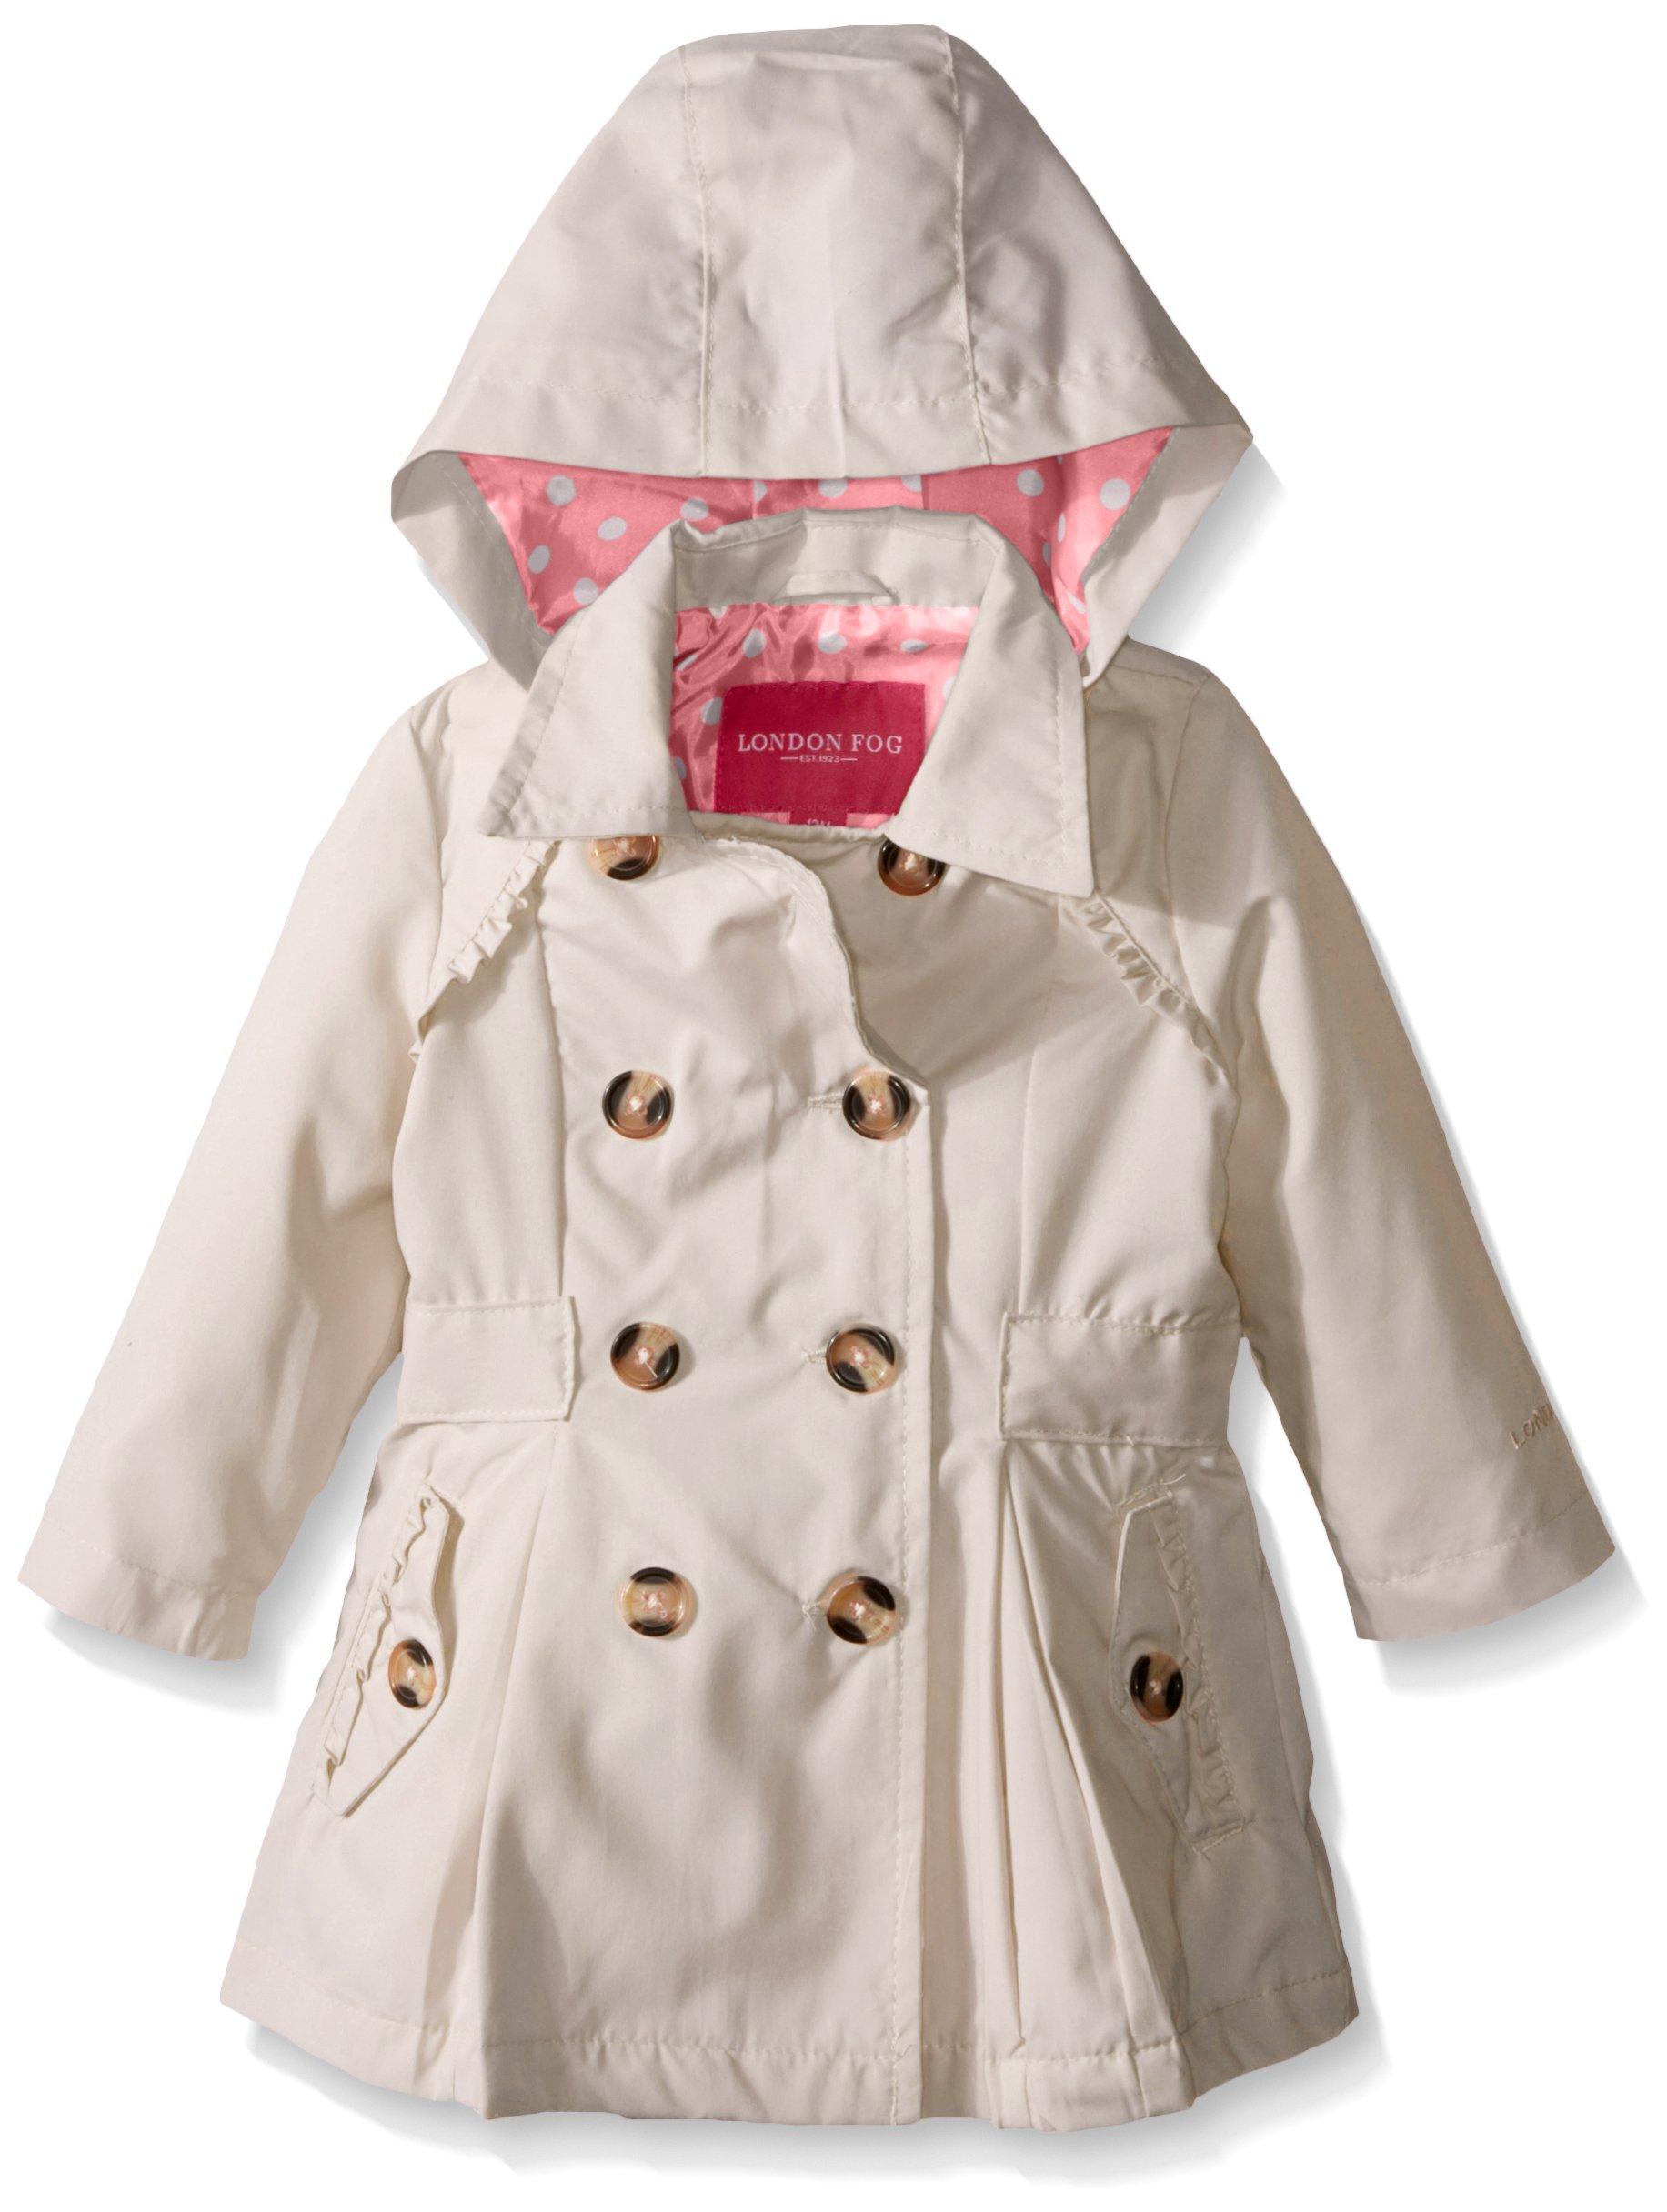 London Fog Baby Girls' Lightweight Trench Coat, Khaki, 12 Months